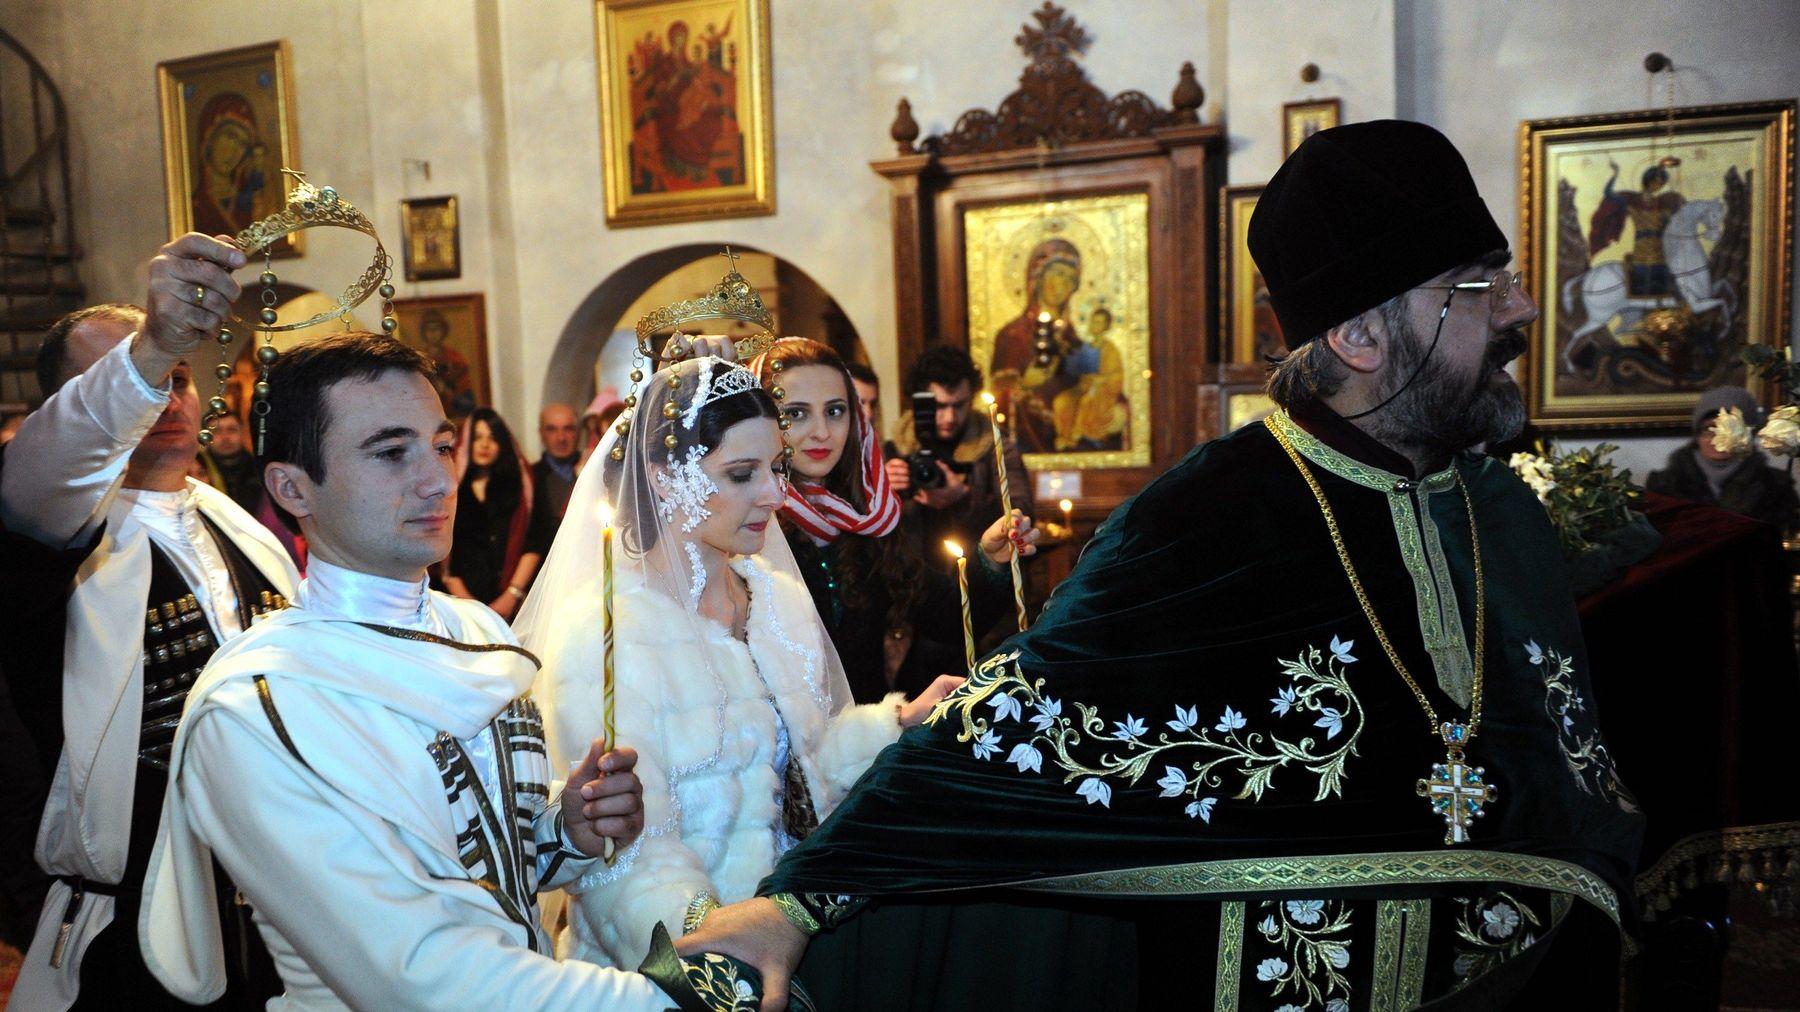 Georgian Orthodox wedding mgid ao image logotv.com 651082